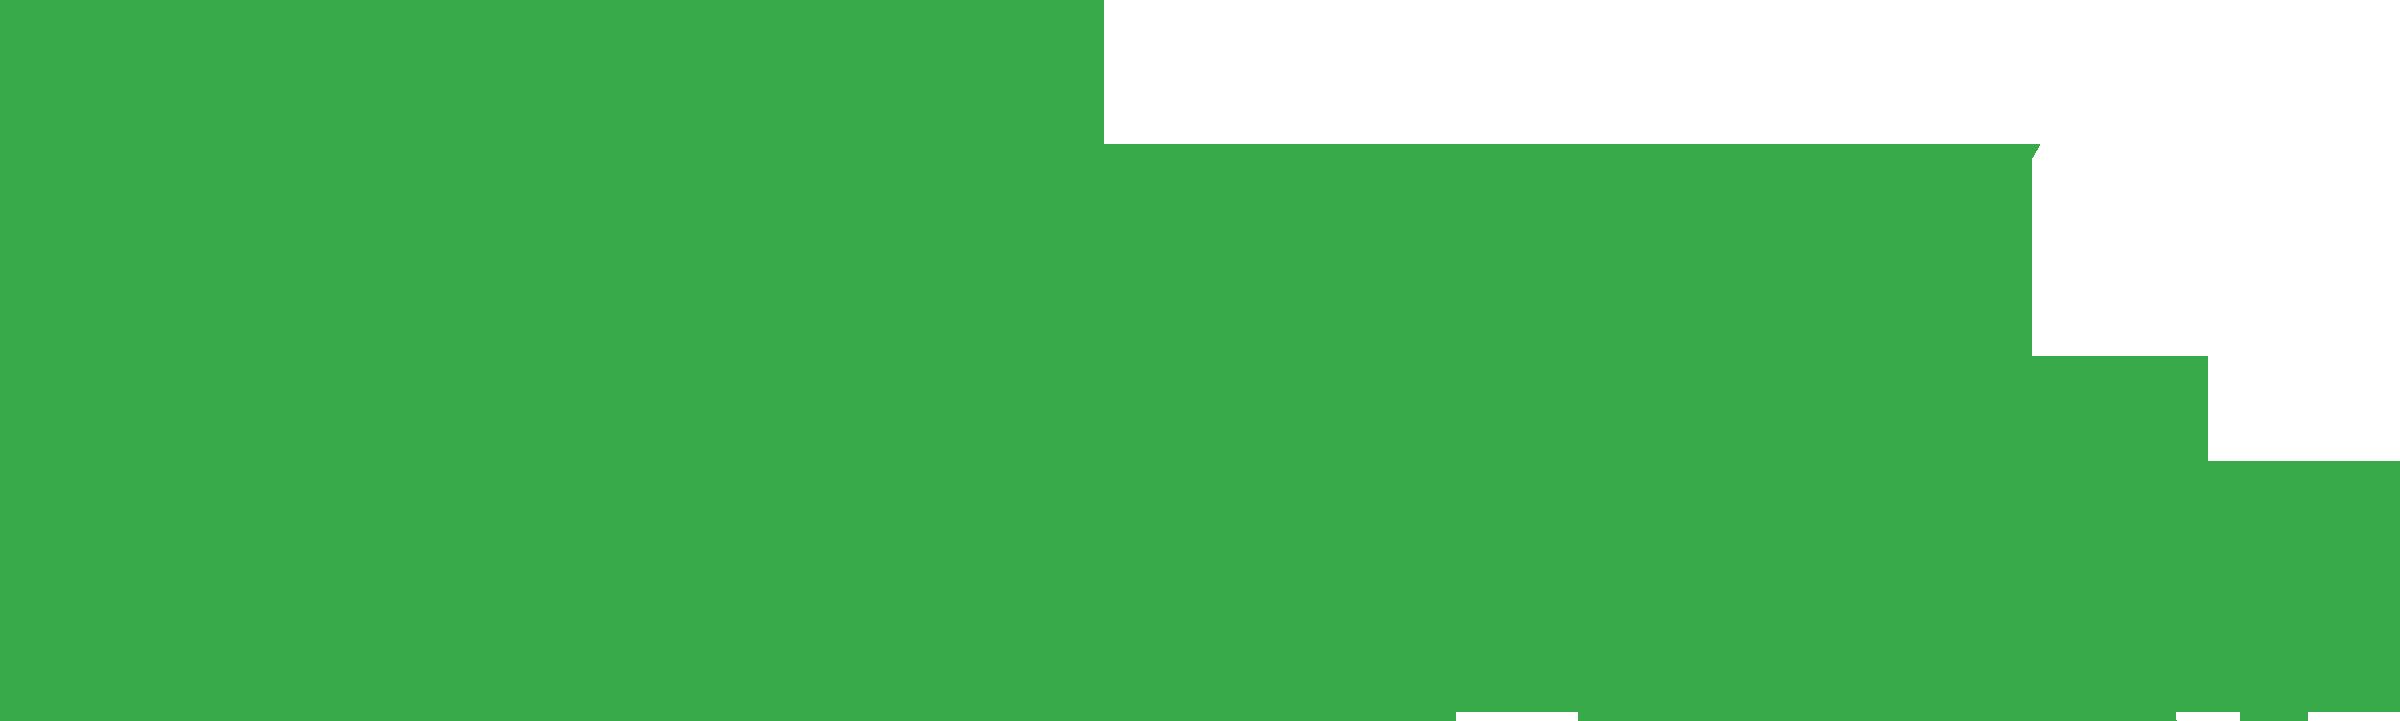 ff_logo_flat_green